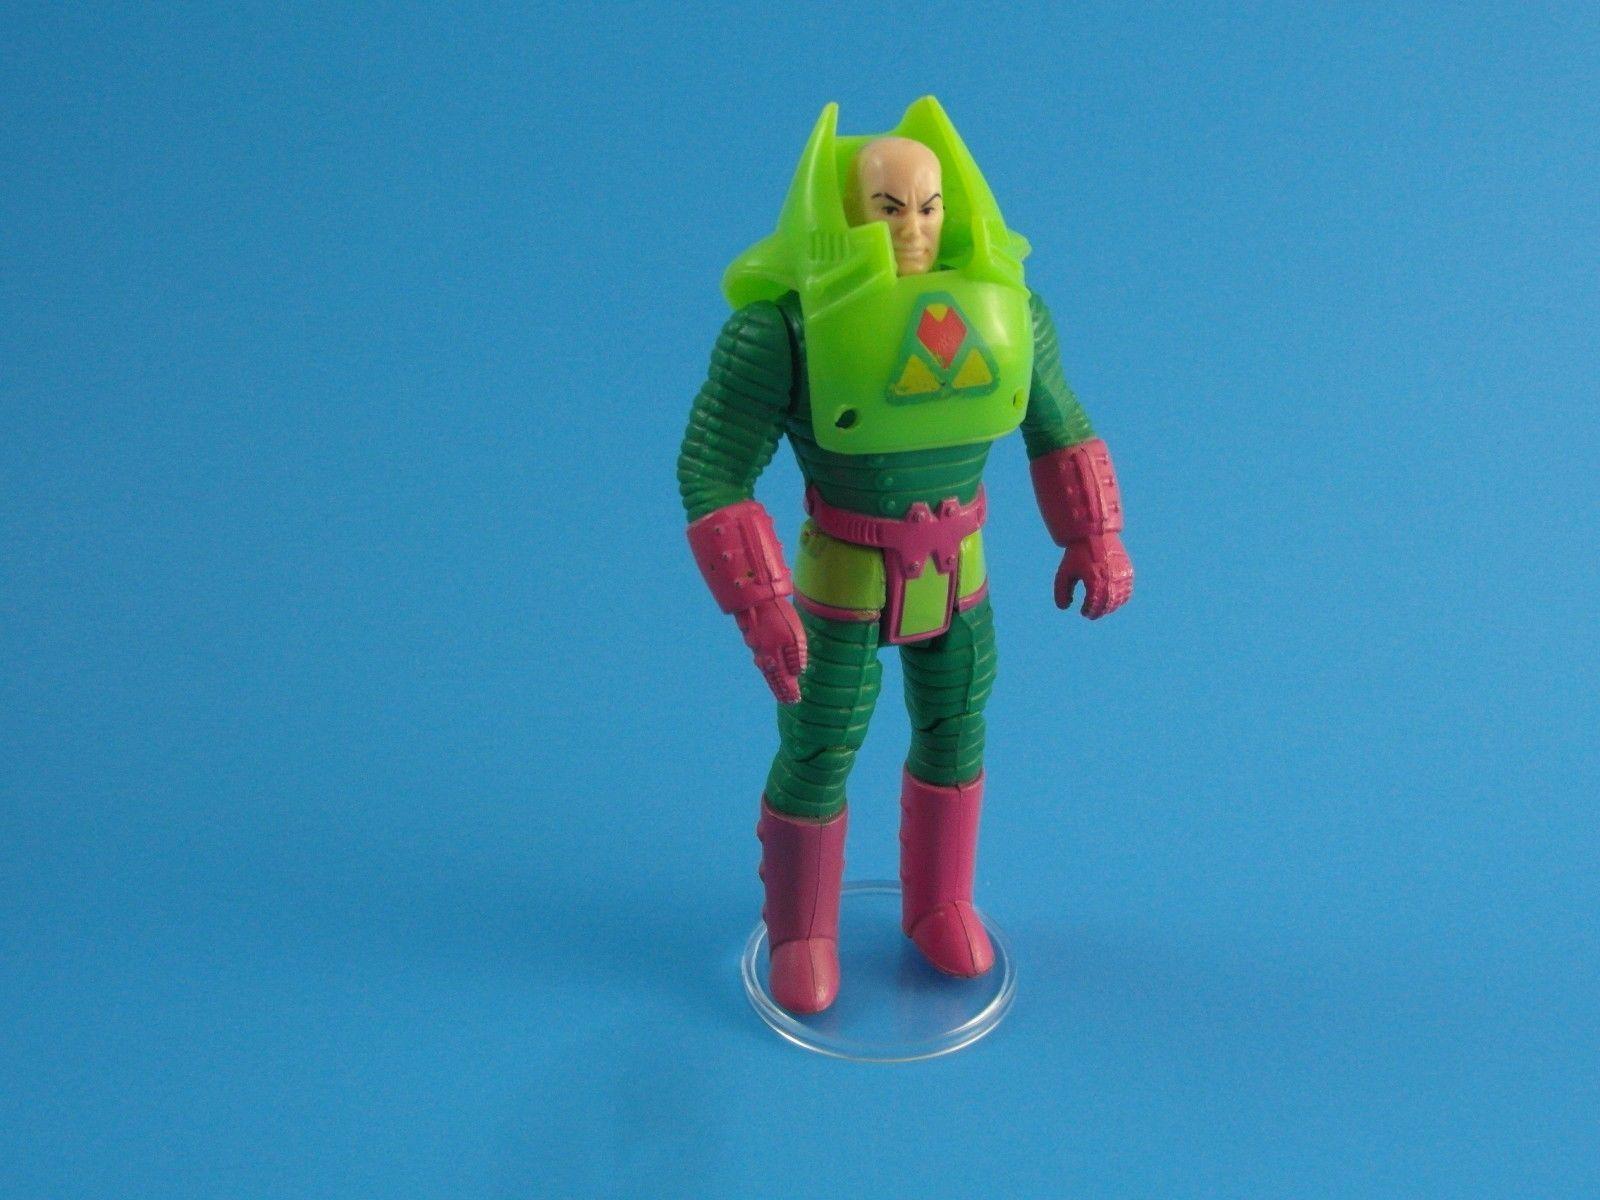 200 x Vintage Super Powers Action Figure Stands - Clear  T2c